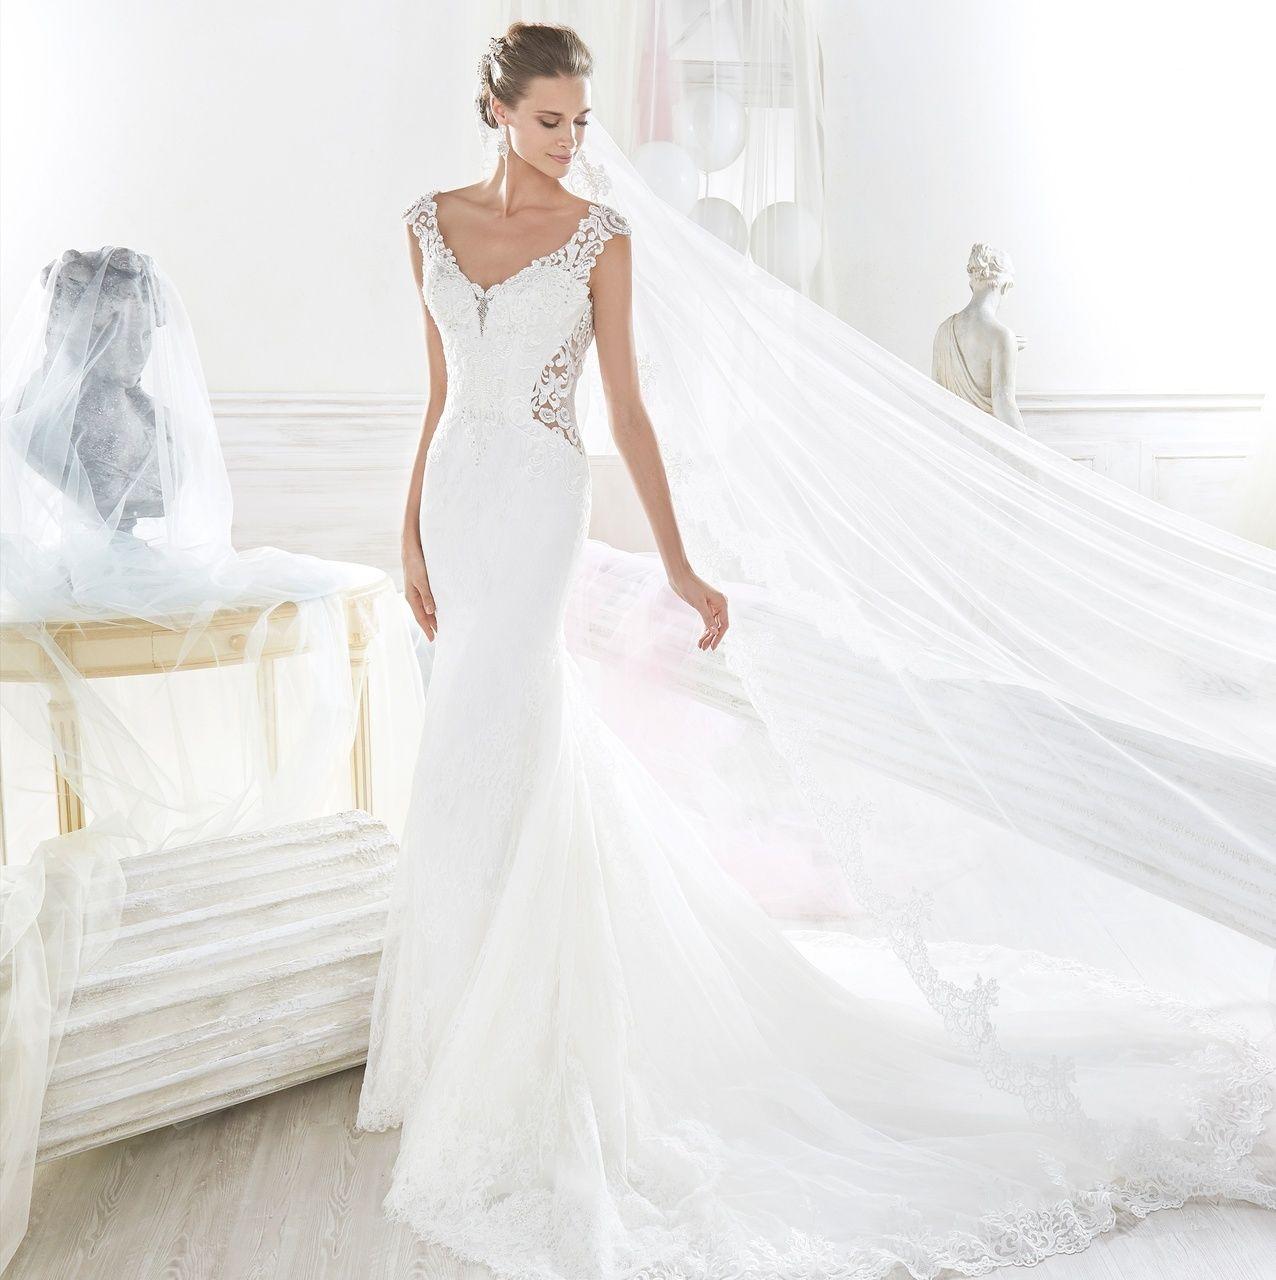 Nicole spose 0134982 Crepe wedding dress, Low back